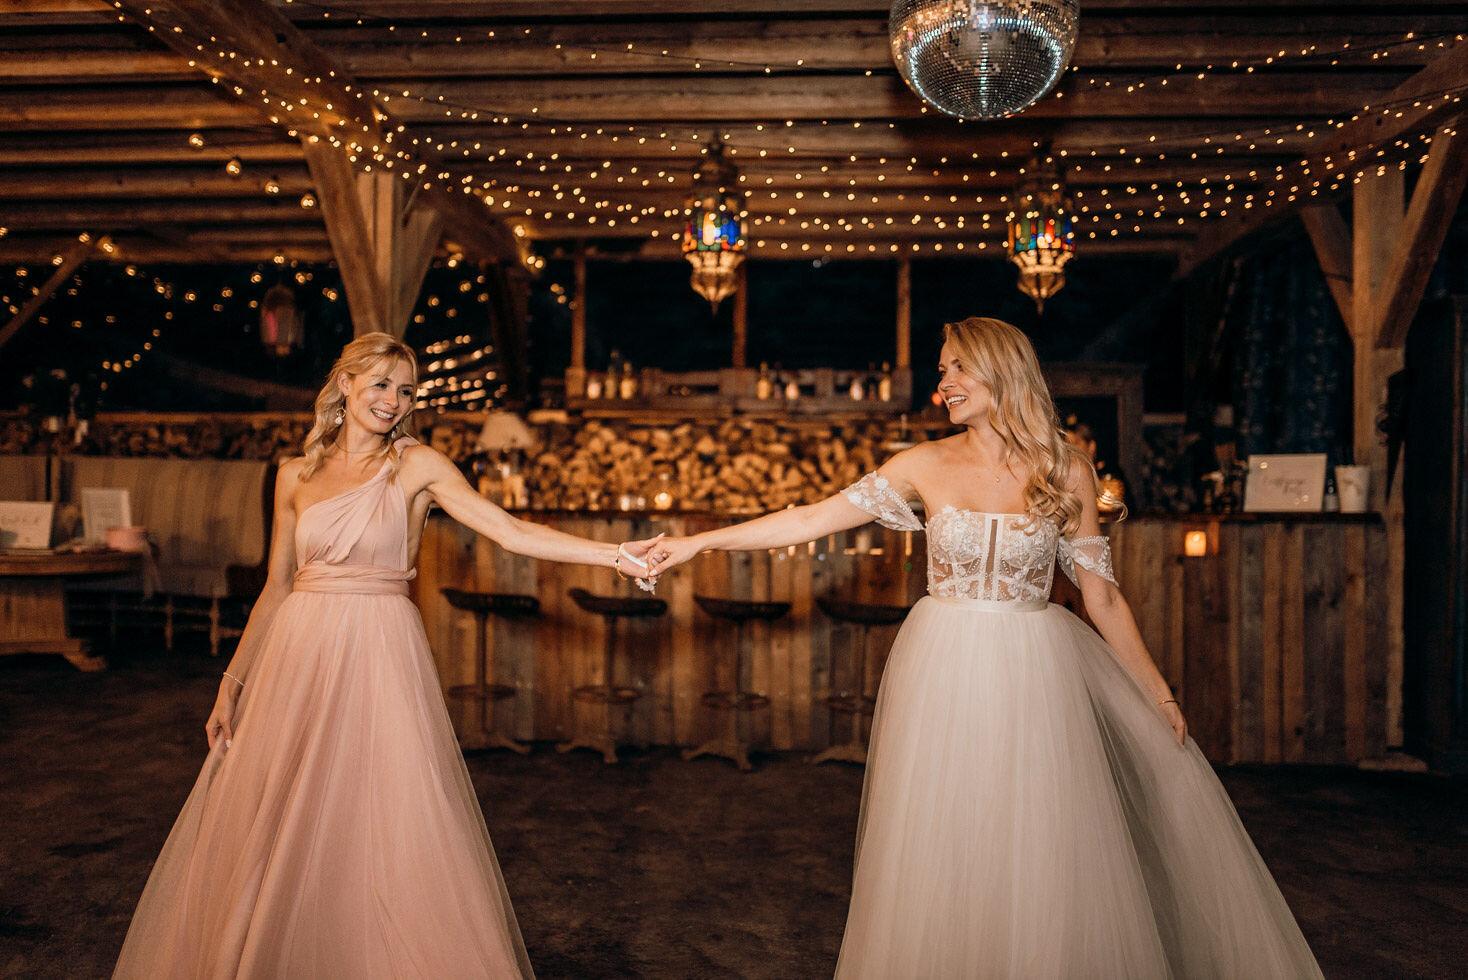 We-Are-Flowergirls-Bridesmaids-Dresses-Bride-PATRIZIA-PALME-©Beloved-Photography-14.jpg